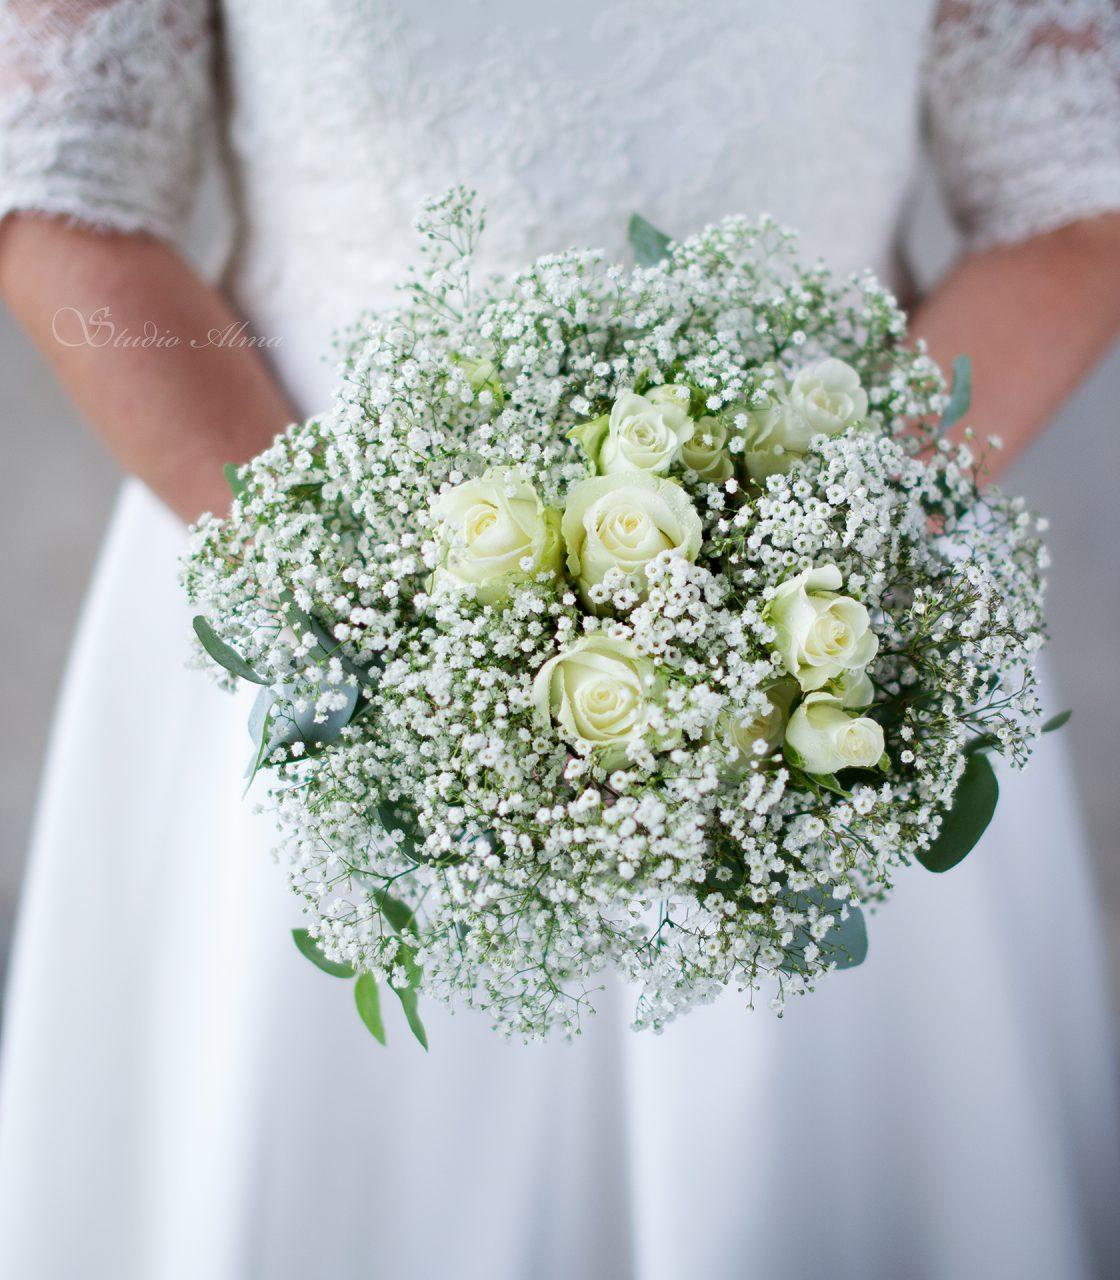 brud-brudekjole-brudebukett-fotograf-studioalma